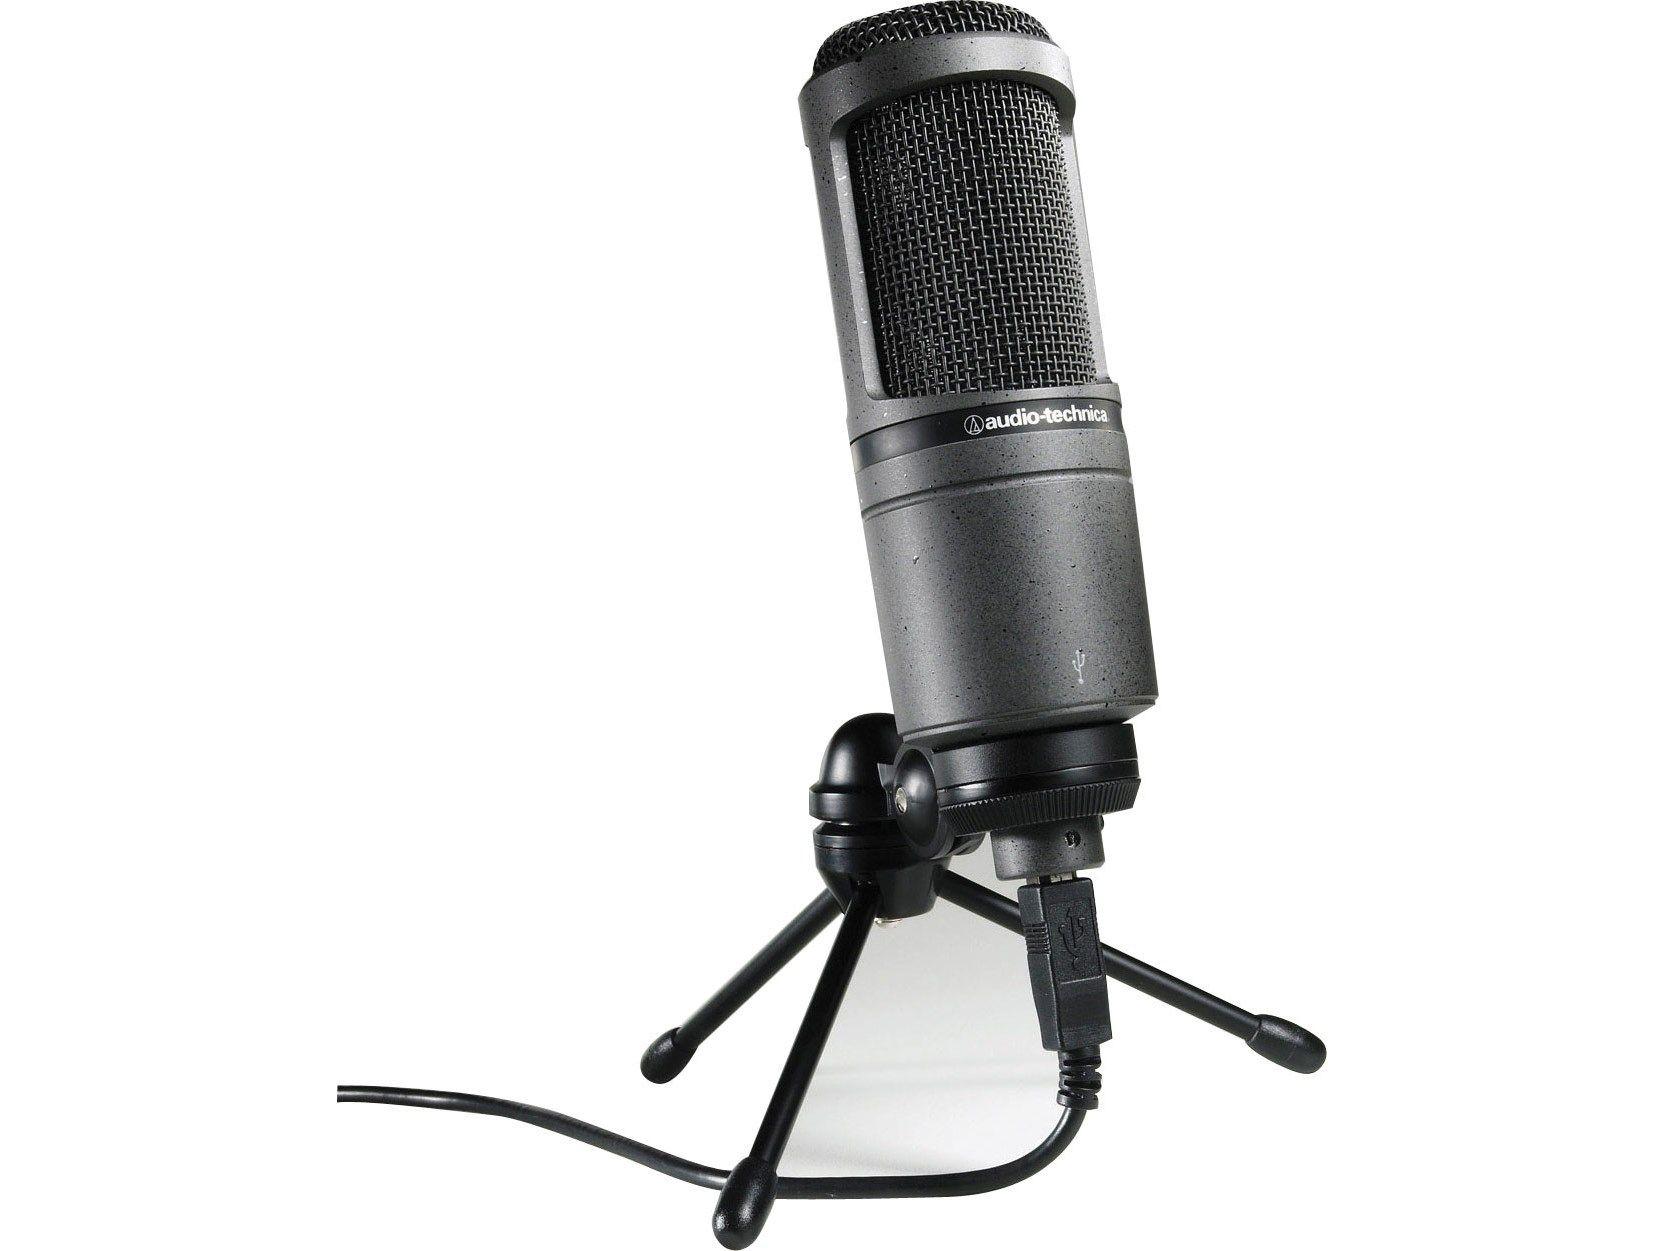 Audio Technica At2020 Usb Desktop Microphone At2020 Usb Ple Computers Online Australia Usb Microphone Best Usb Microphone Audio Technica